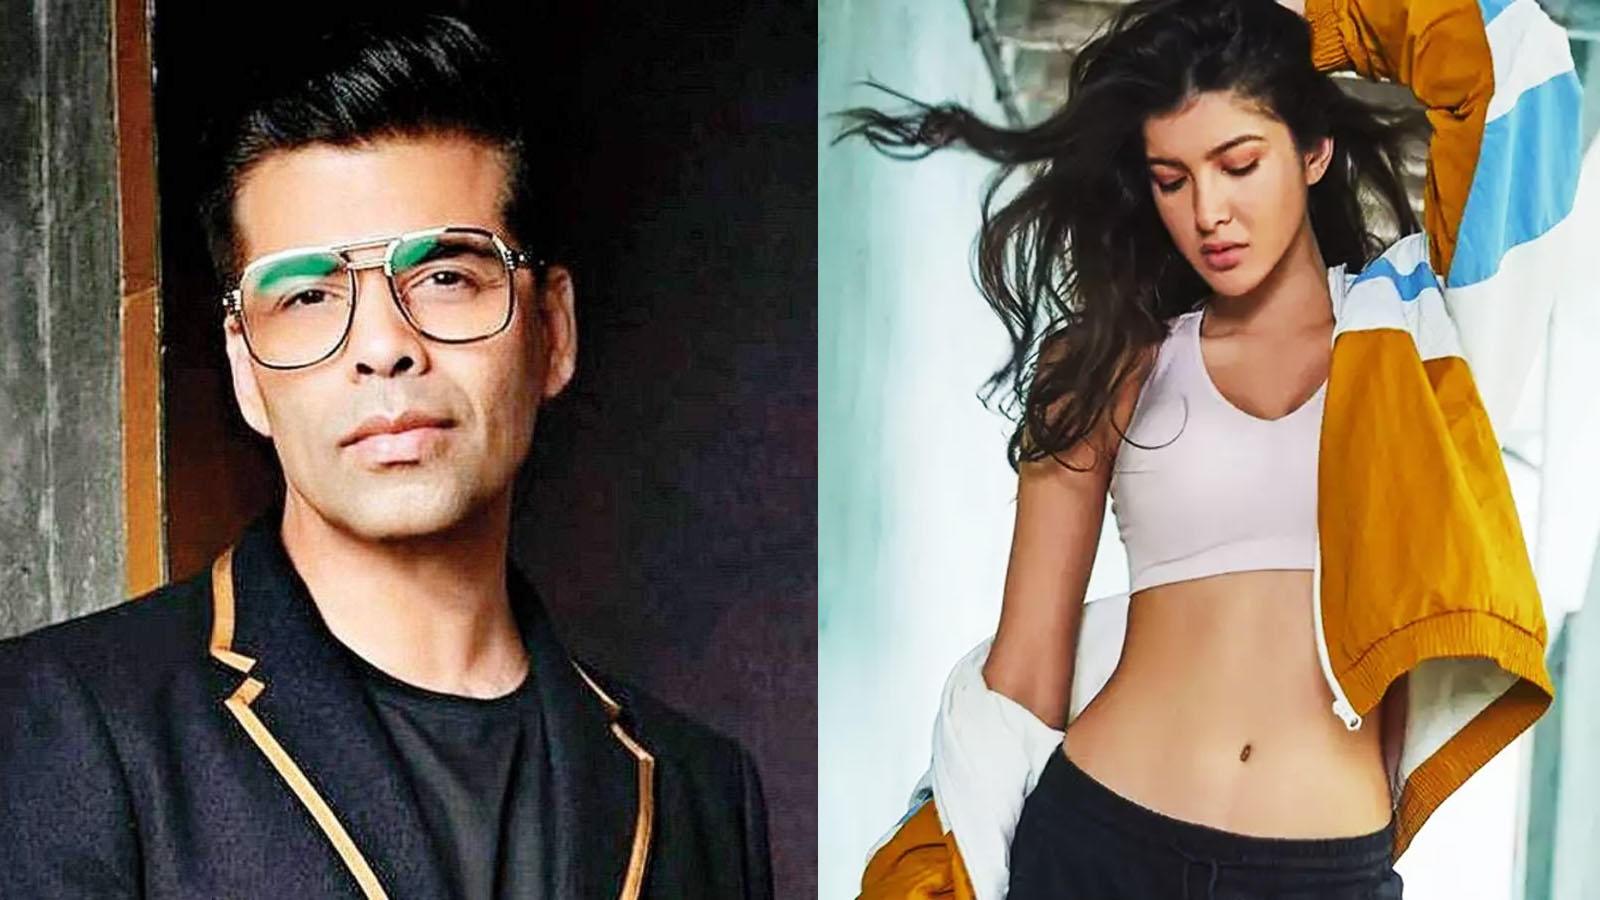 Karan Johar trolled for announcing Sanjay Kapoor's daughter Shanaya  Kapoor's debut, netizens write 'nepotism at its finest' | Hindi Movie News  - Bollywood - Times of India